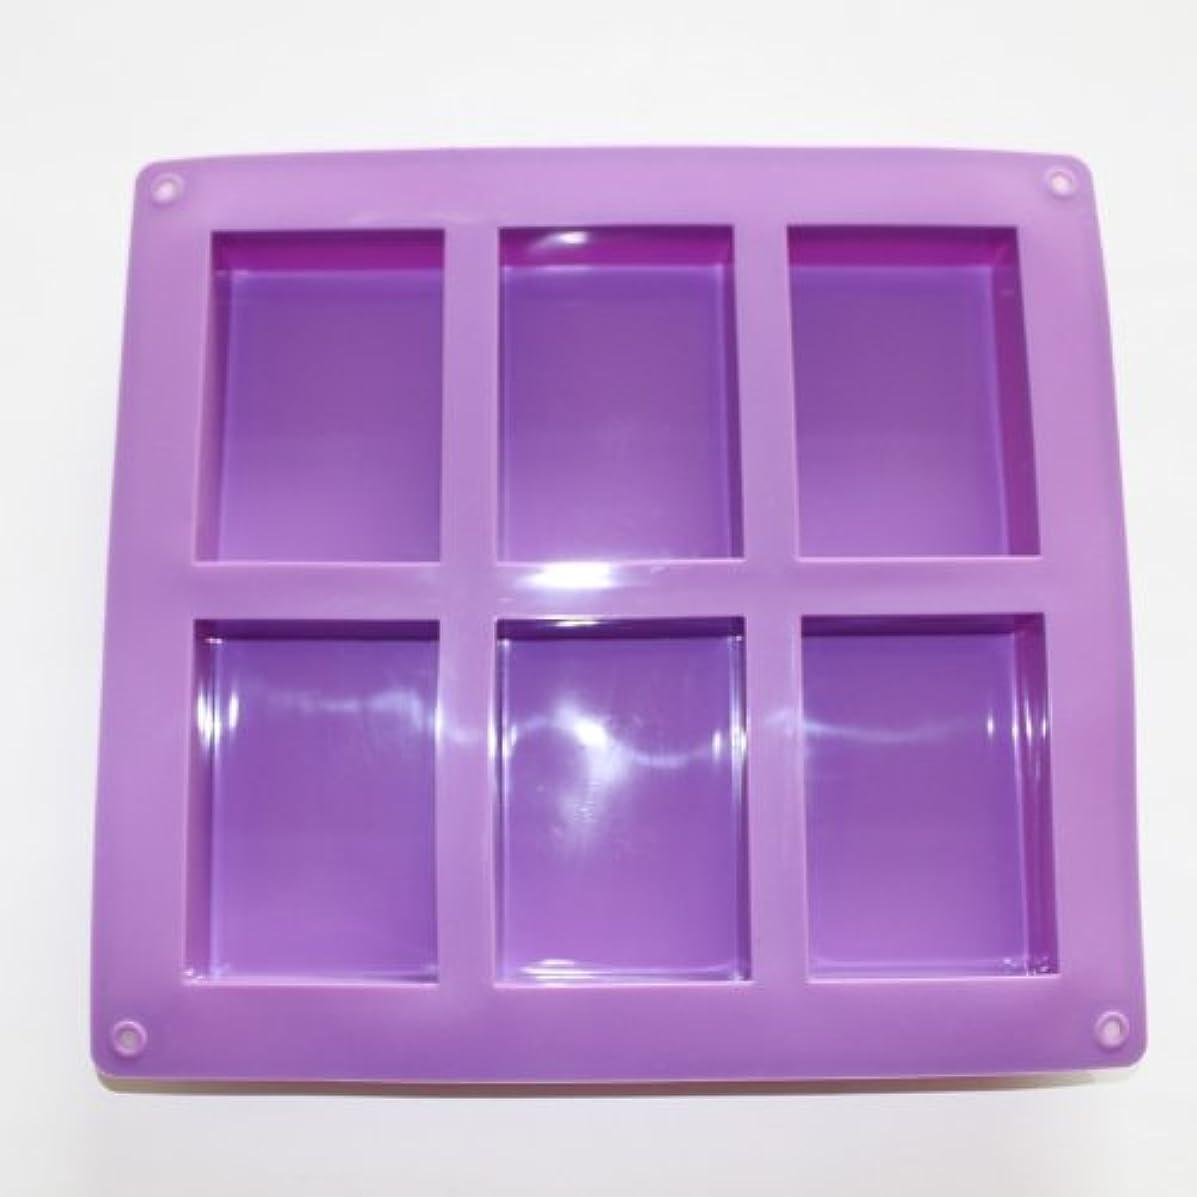 X-Haibei Plain Basic Rectangle Soap Mold Silicone HP Soap Lotion Bar Making Mould Supplies